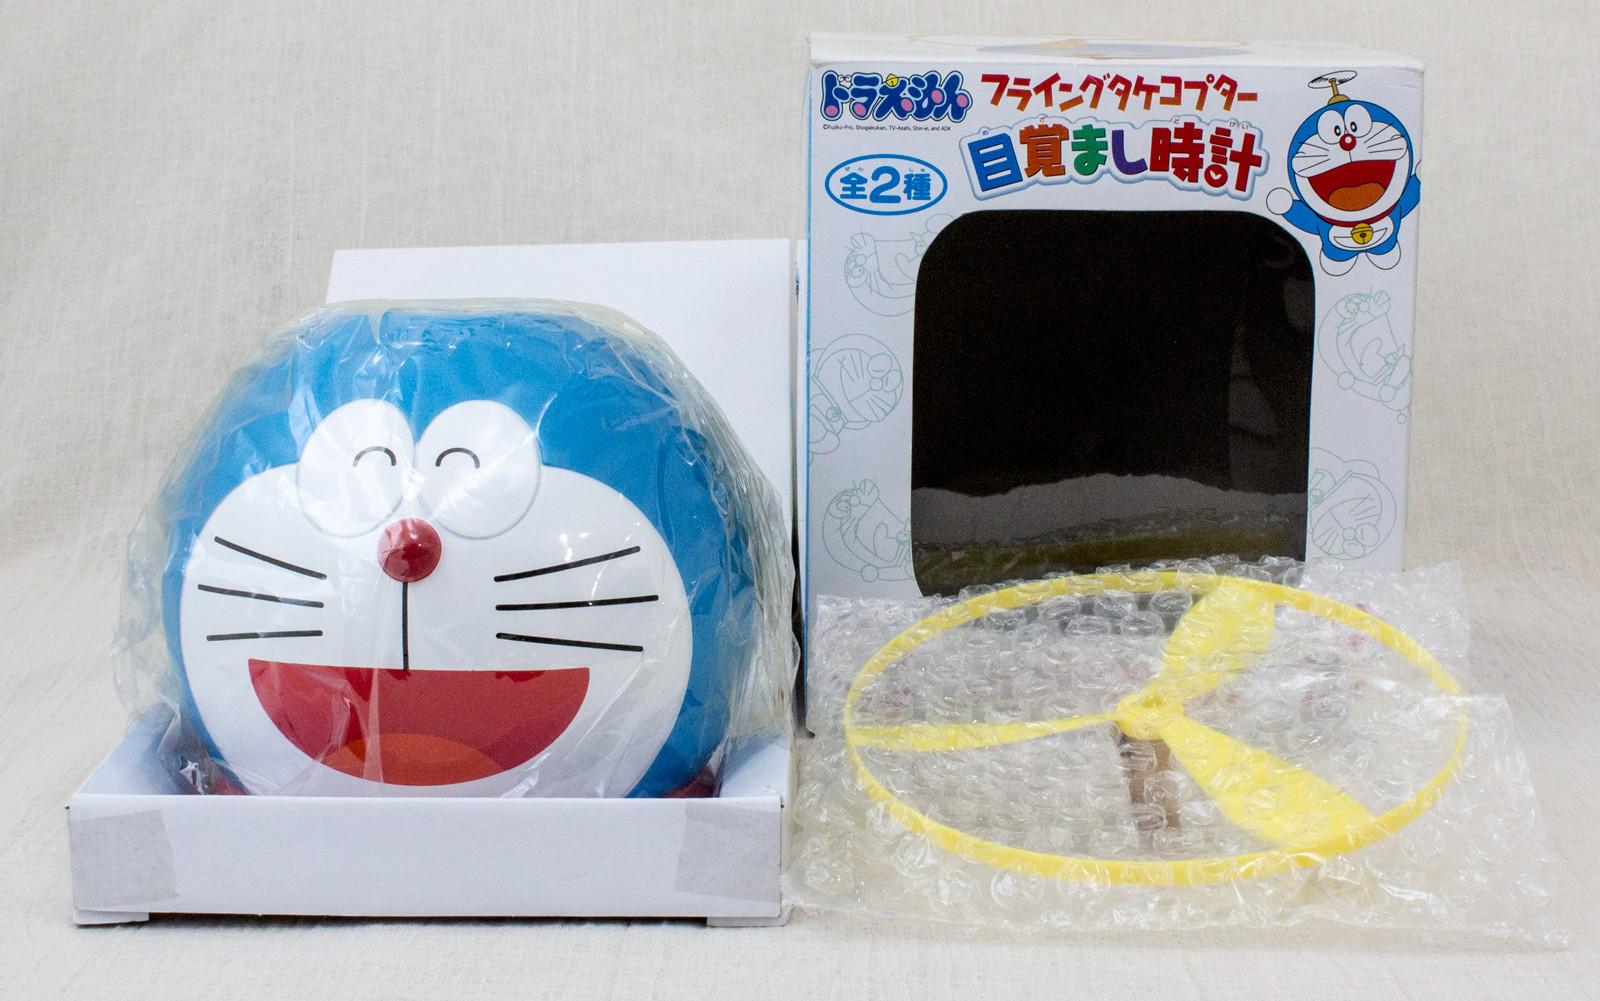 RARE! Doraemon Head Figure Bamboo Copter Alarm Clock JAPAN ANIME